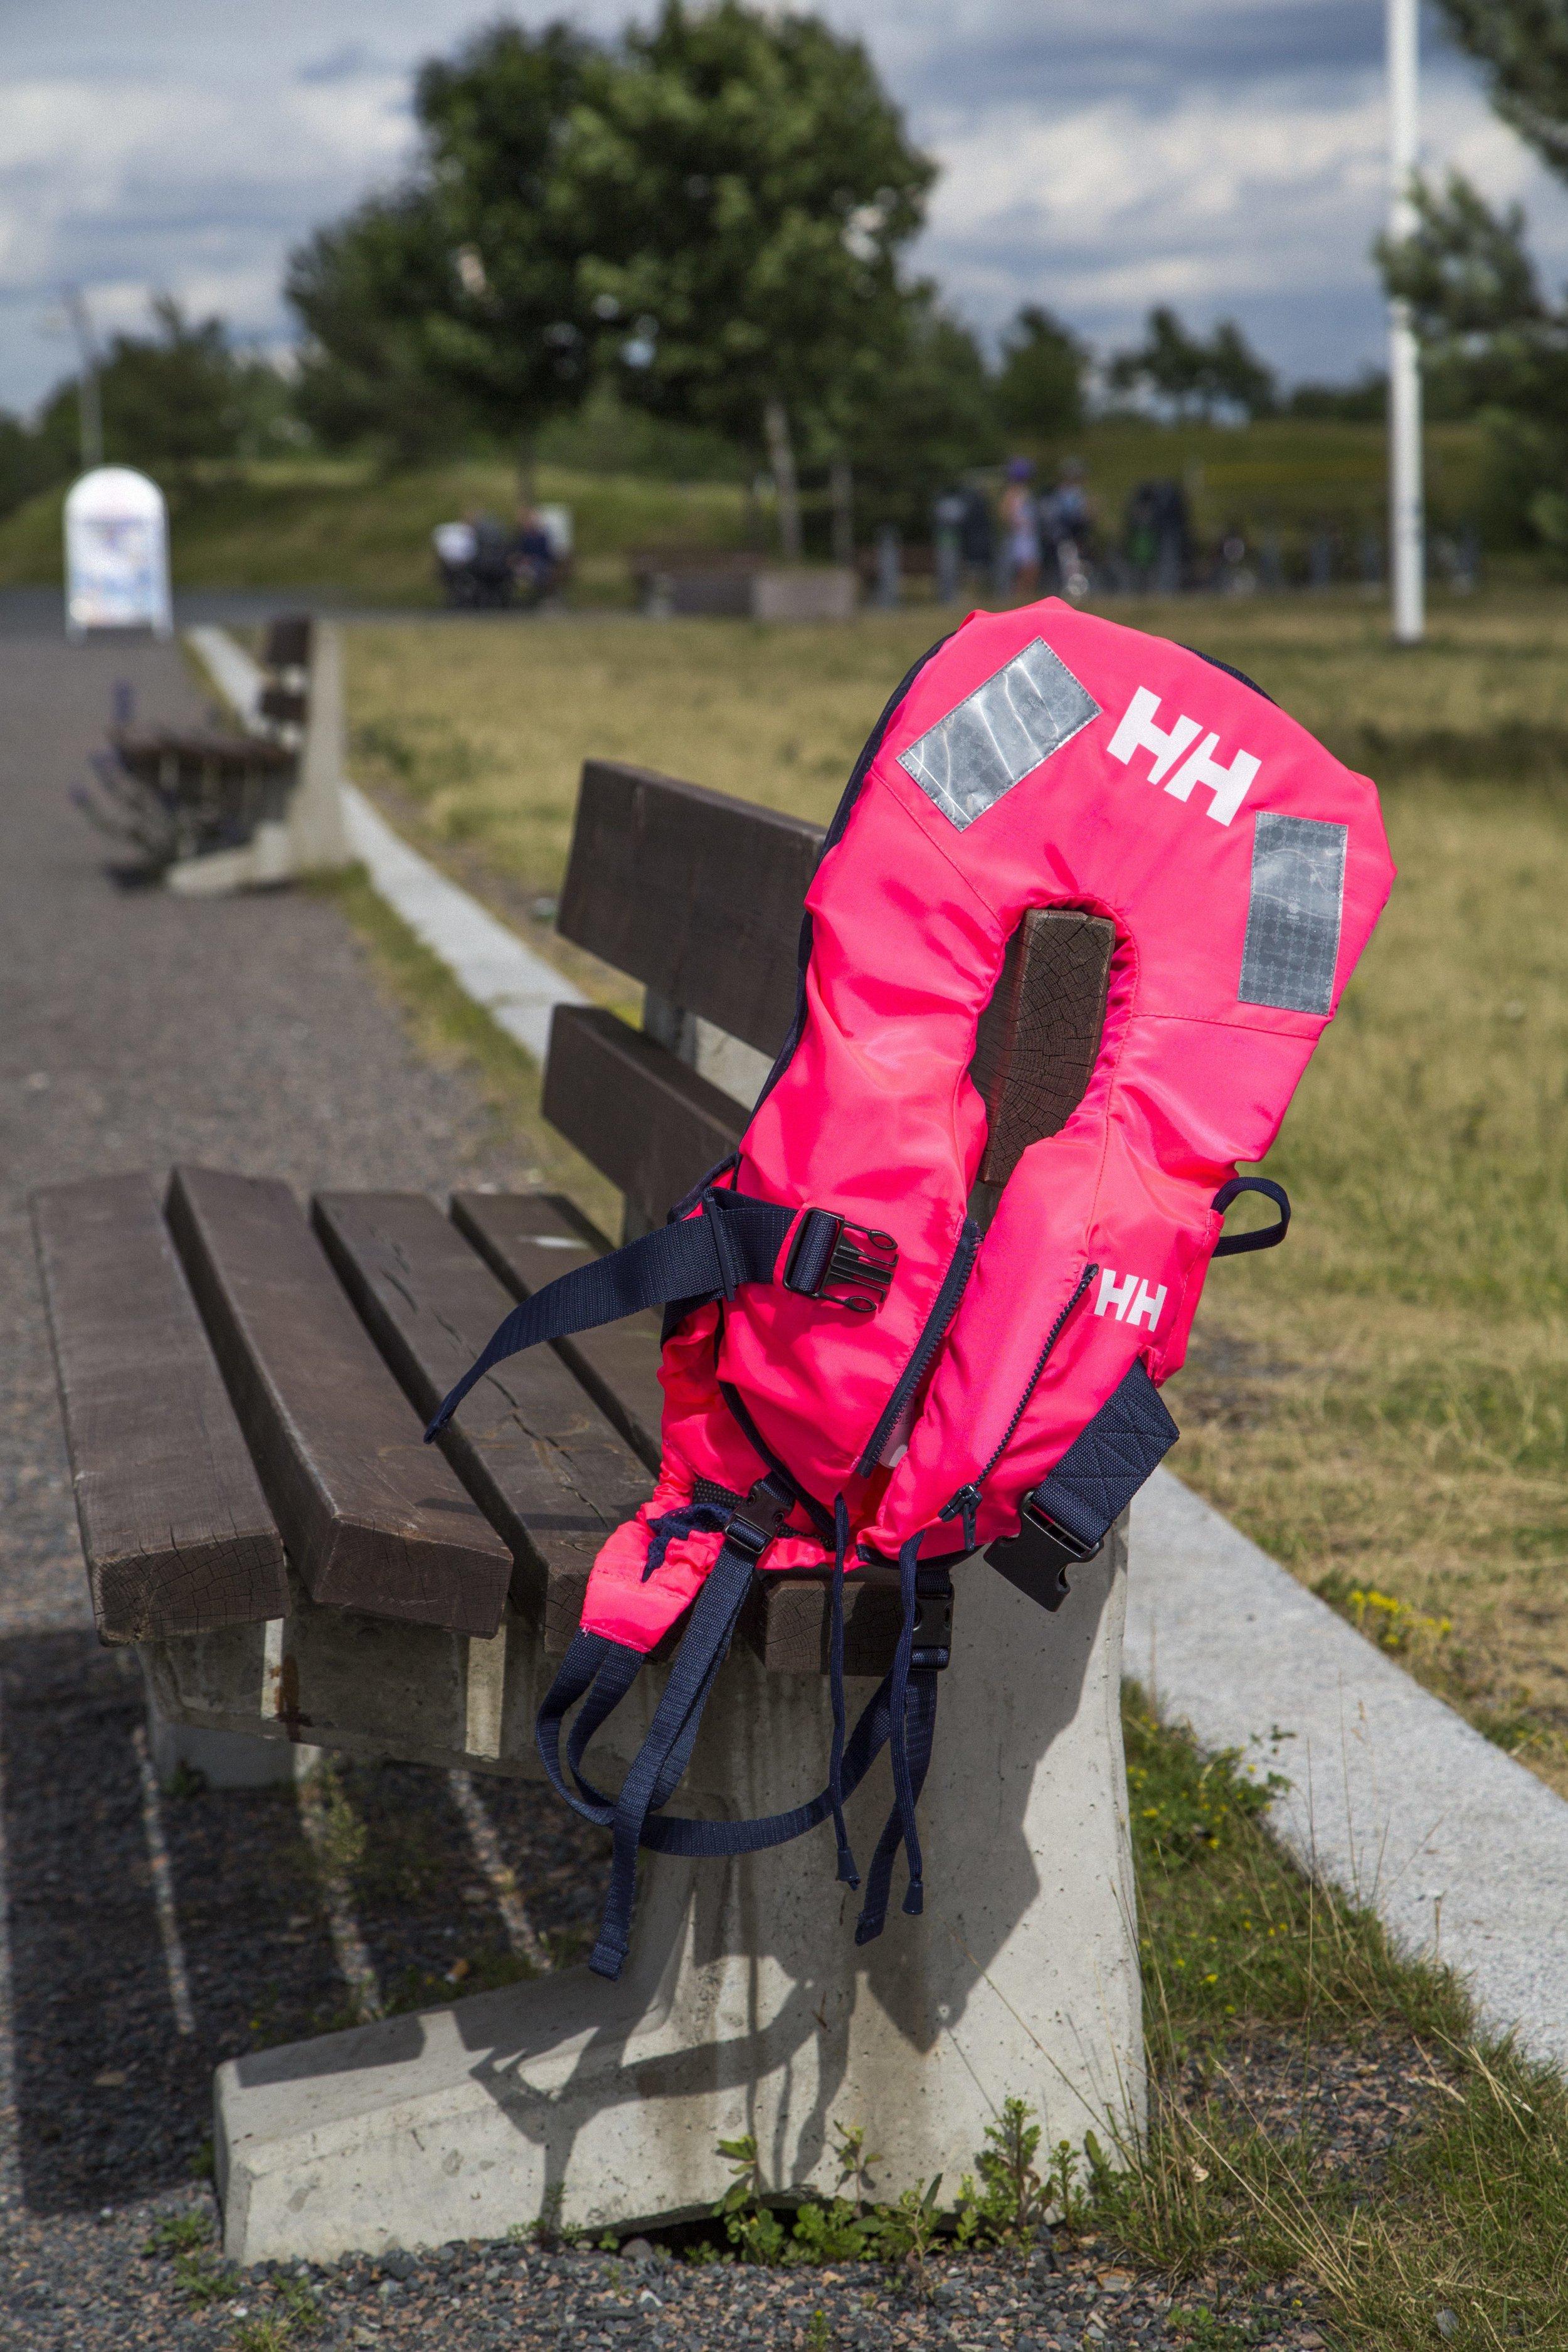 hh-r-vest.jpg